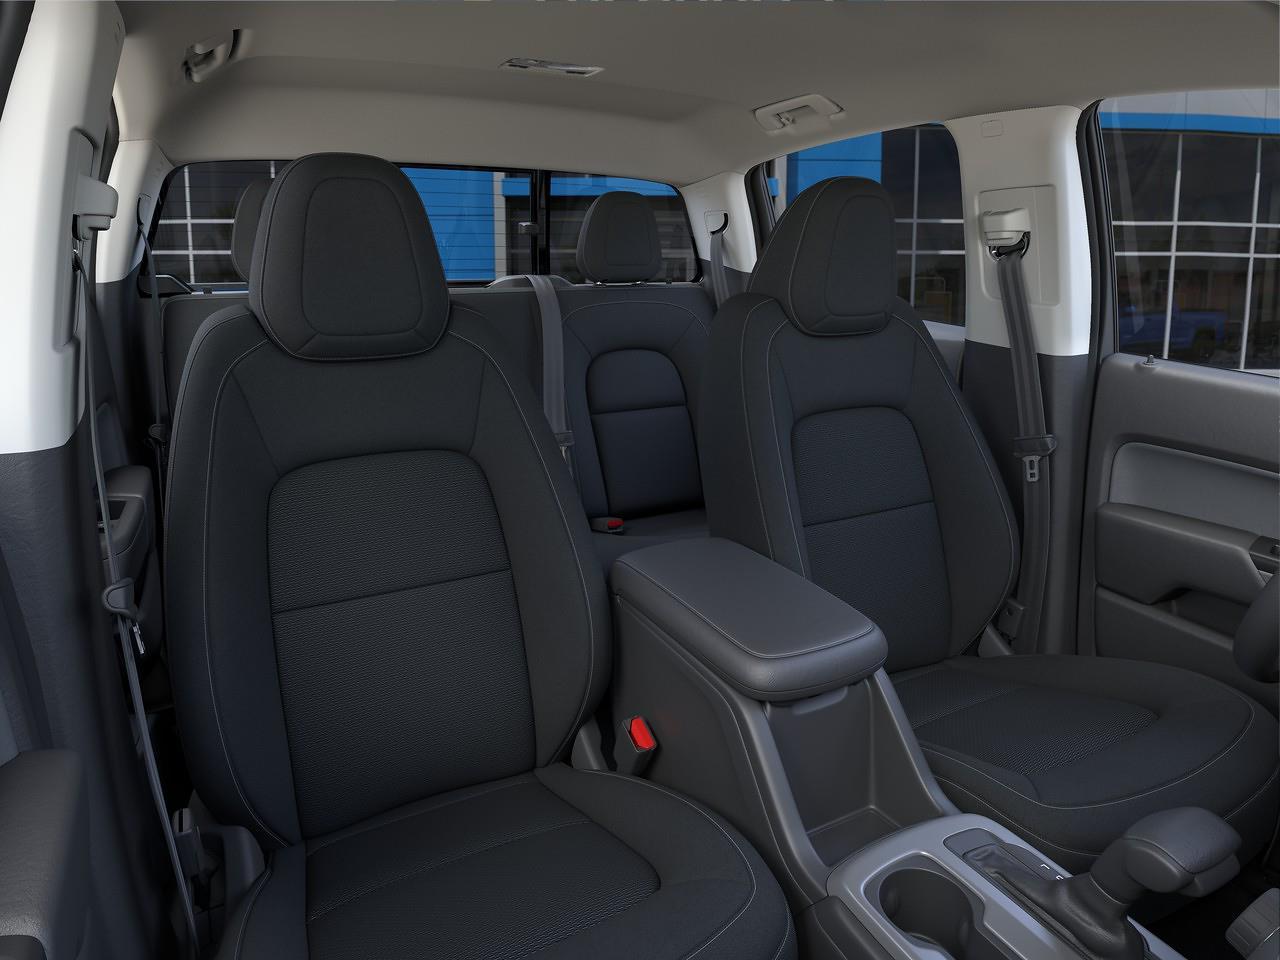 2021 Chevrolet Colorado Crew Cab 4x4, Pickup #Q210428 - photo 13